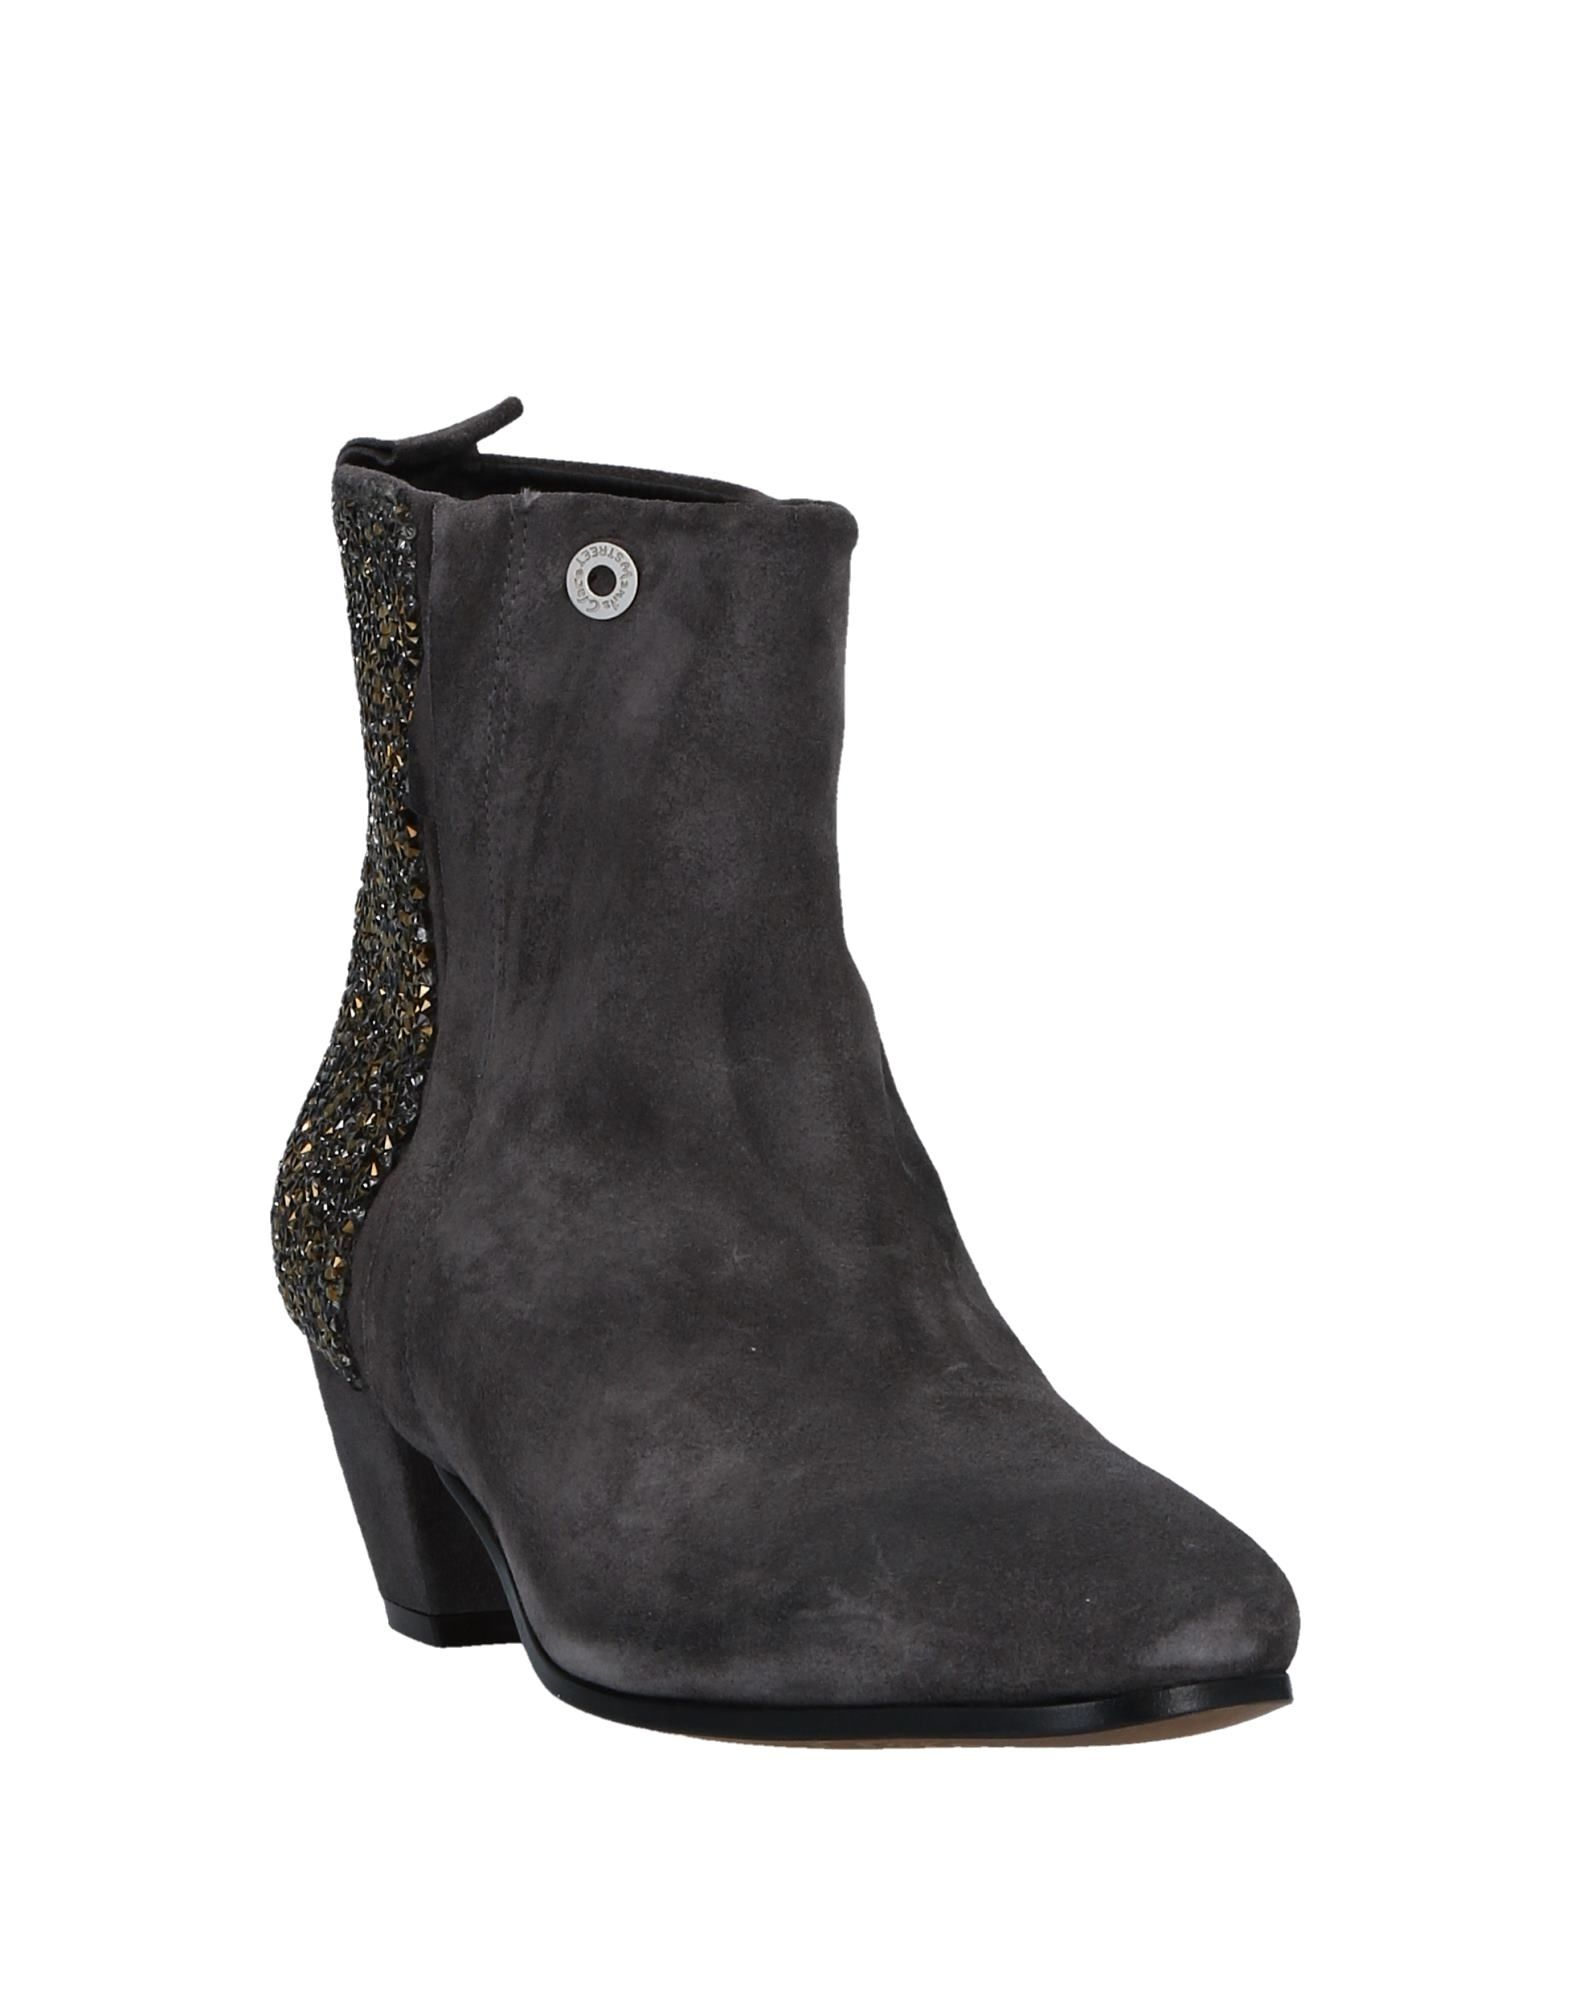 Manila Grace Stiefelette Damen  11524867GE 11524867GE  Neue Schuhe 296278